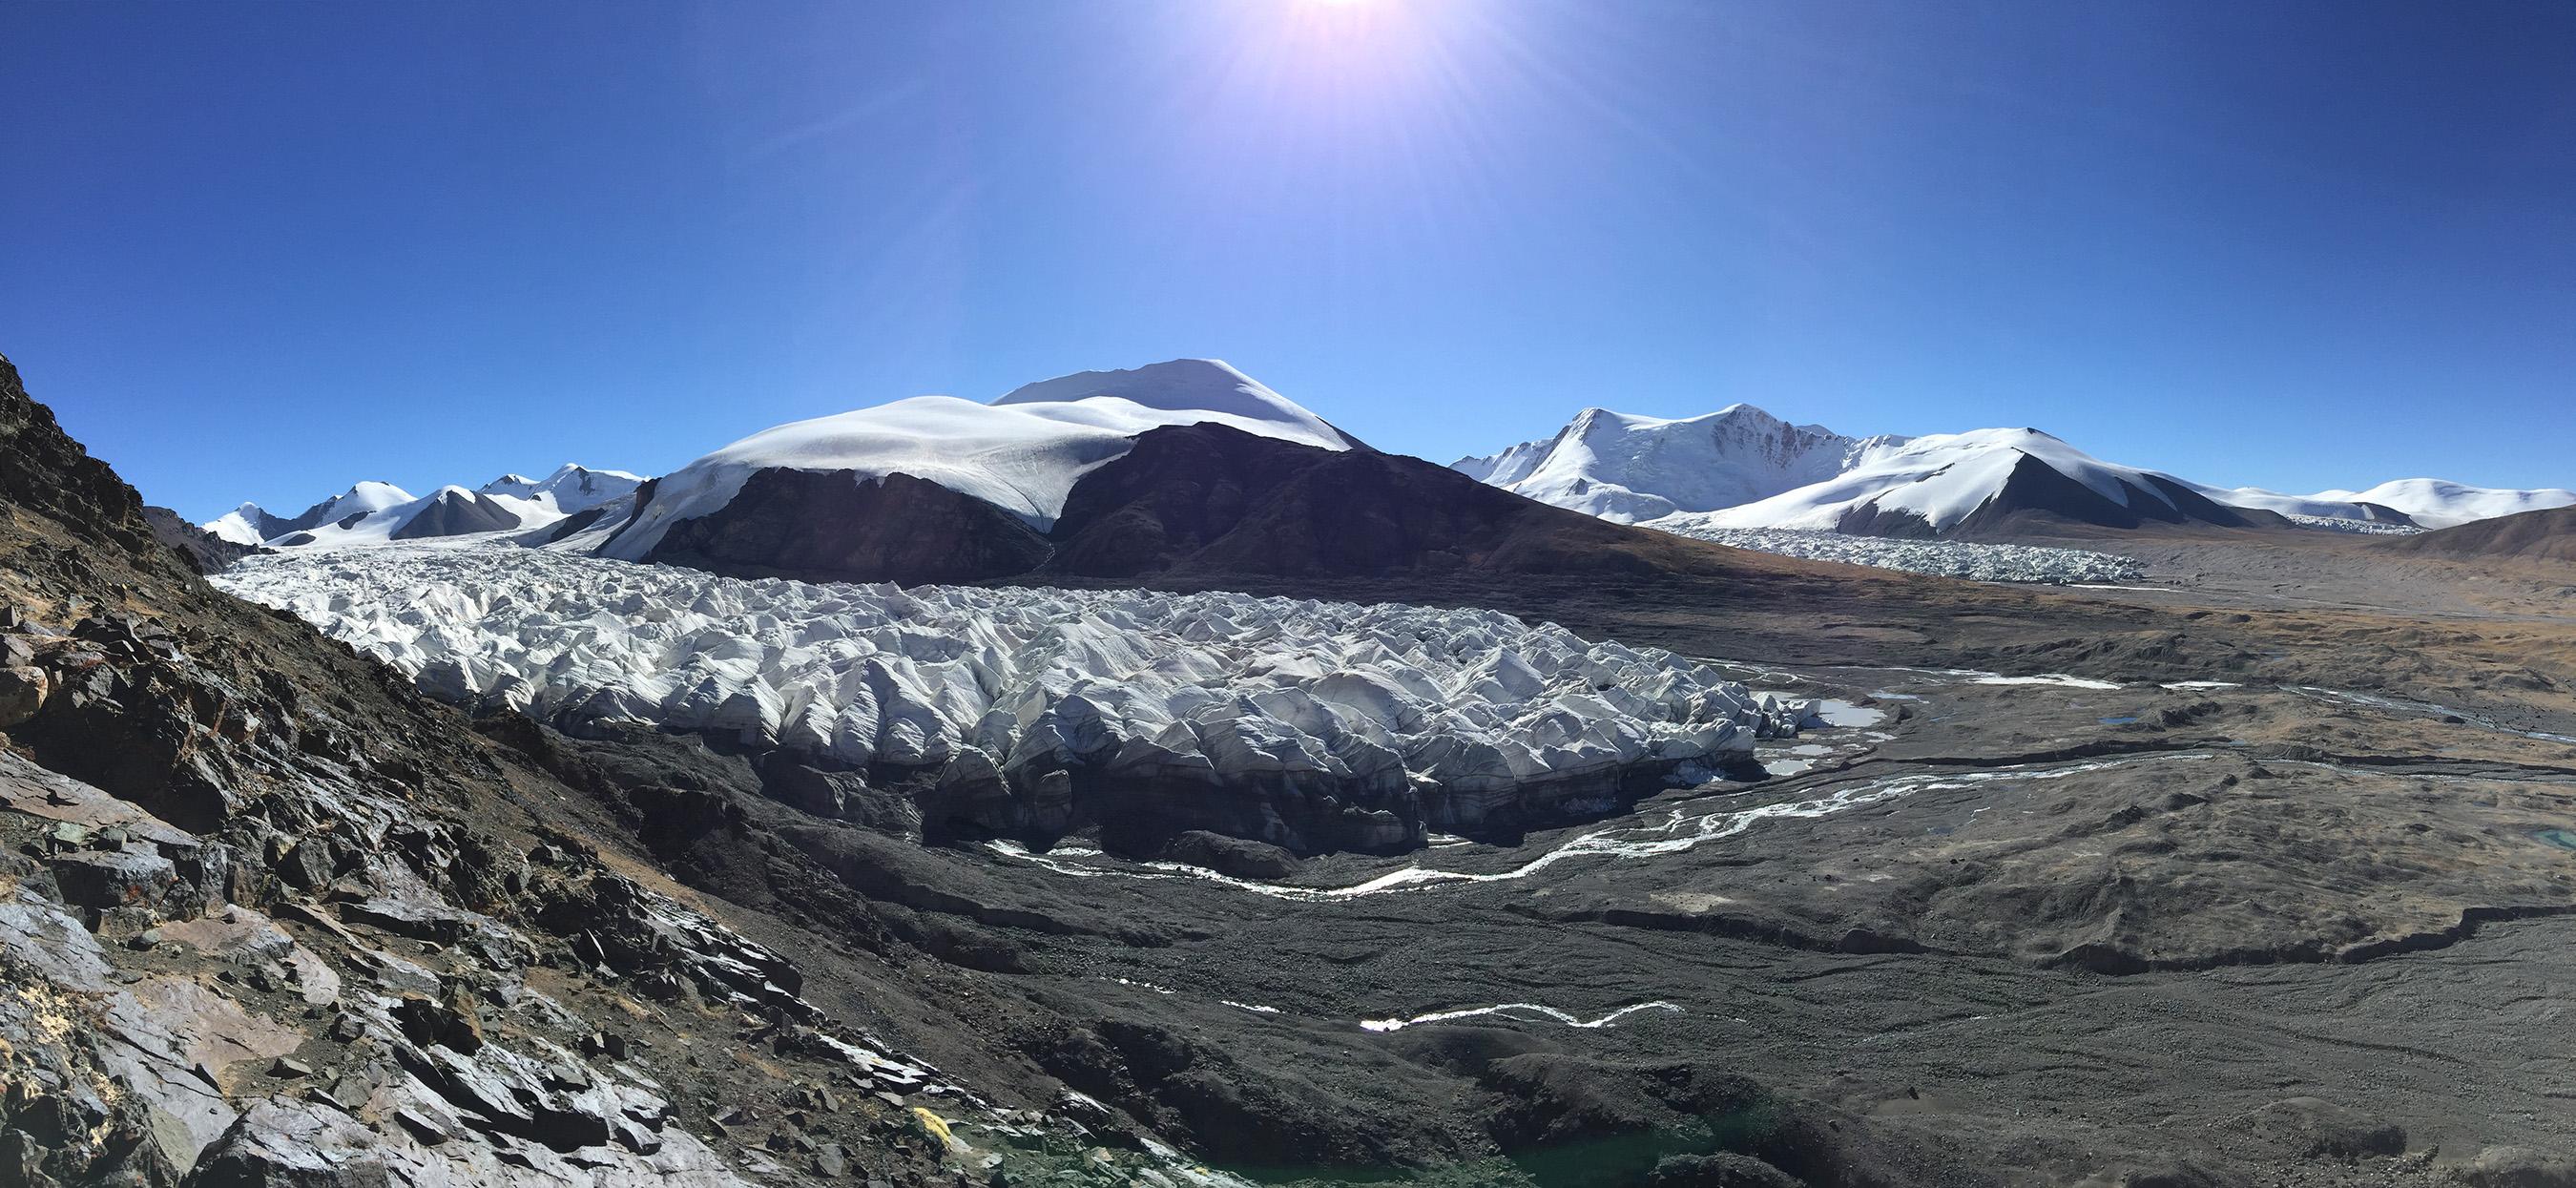 Ginger Goodey Glacier: Yangtze River Source